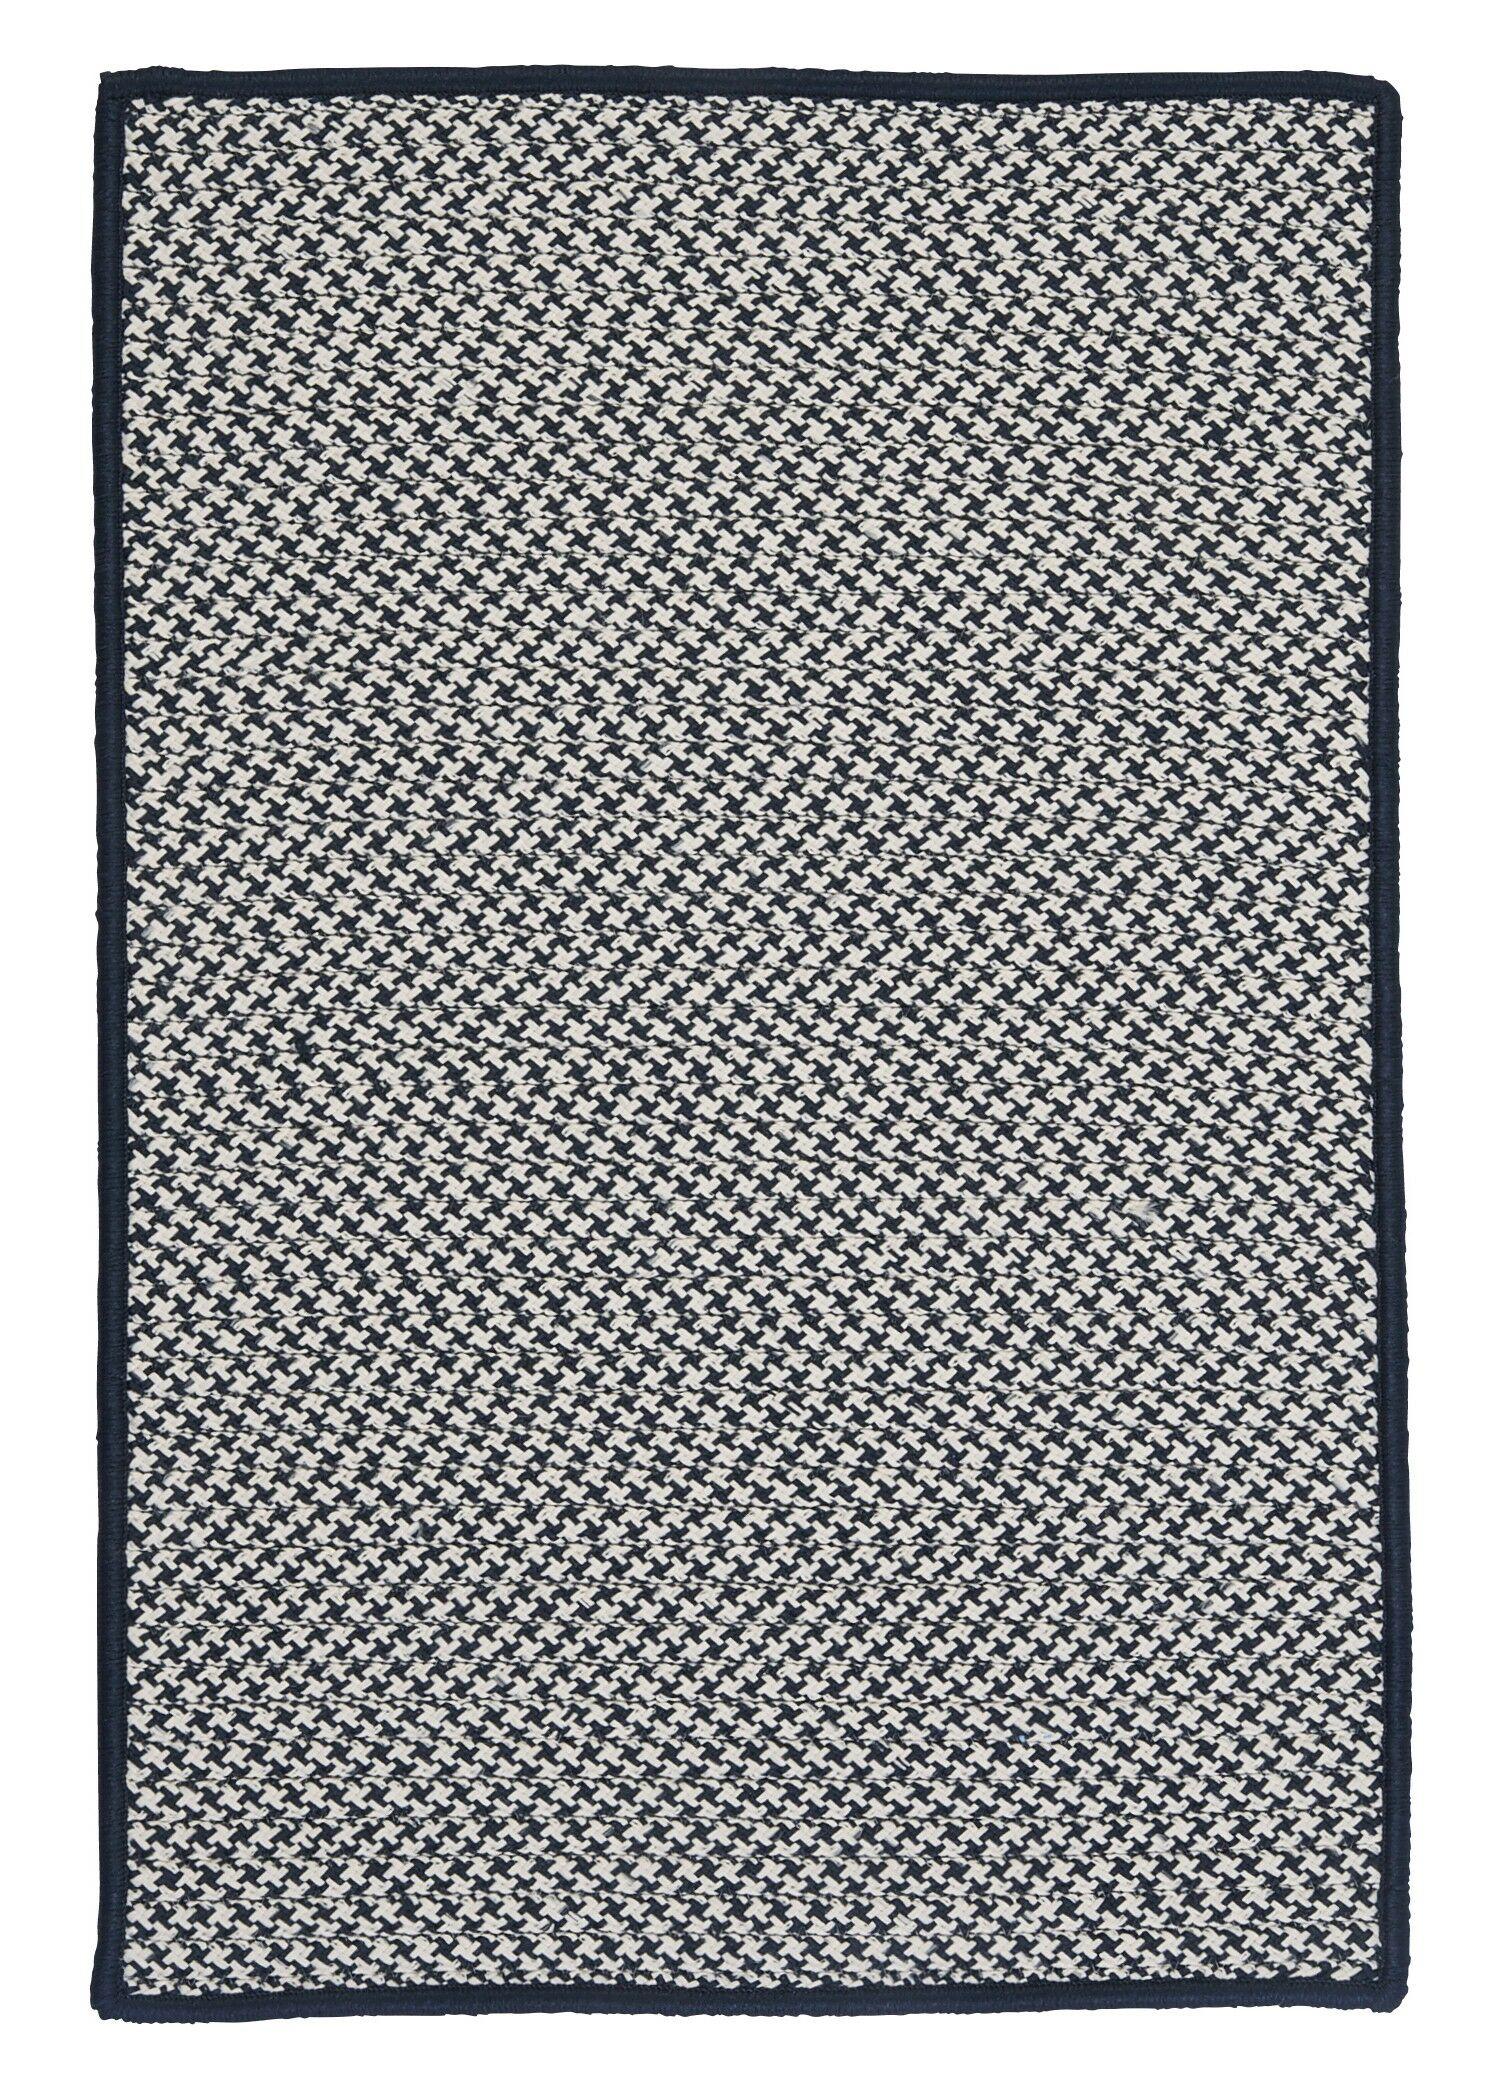 Outdoor Houndstooth Tweed Navy Rug Rug Size: Rectangle 2' x 4'